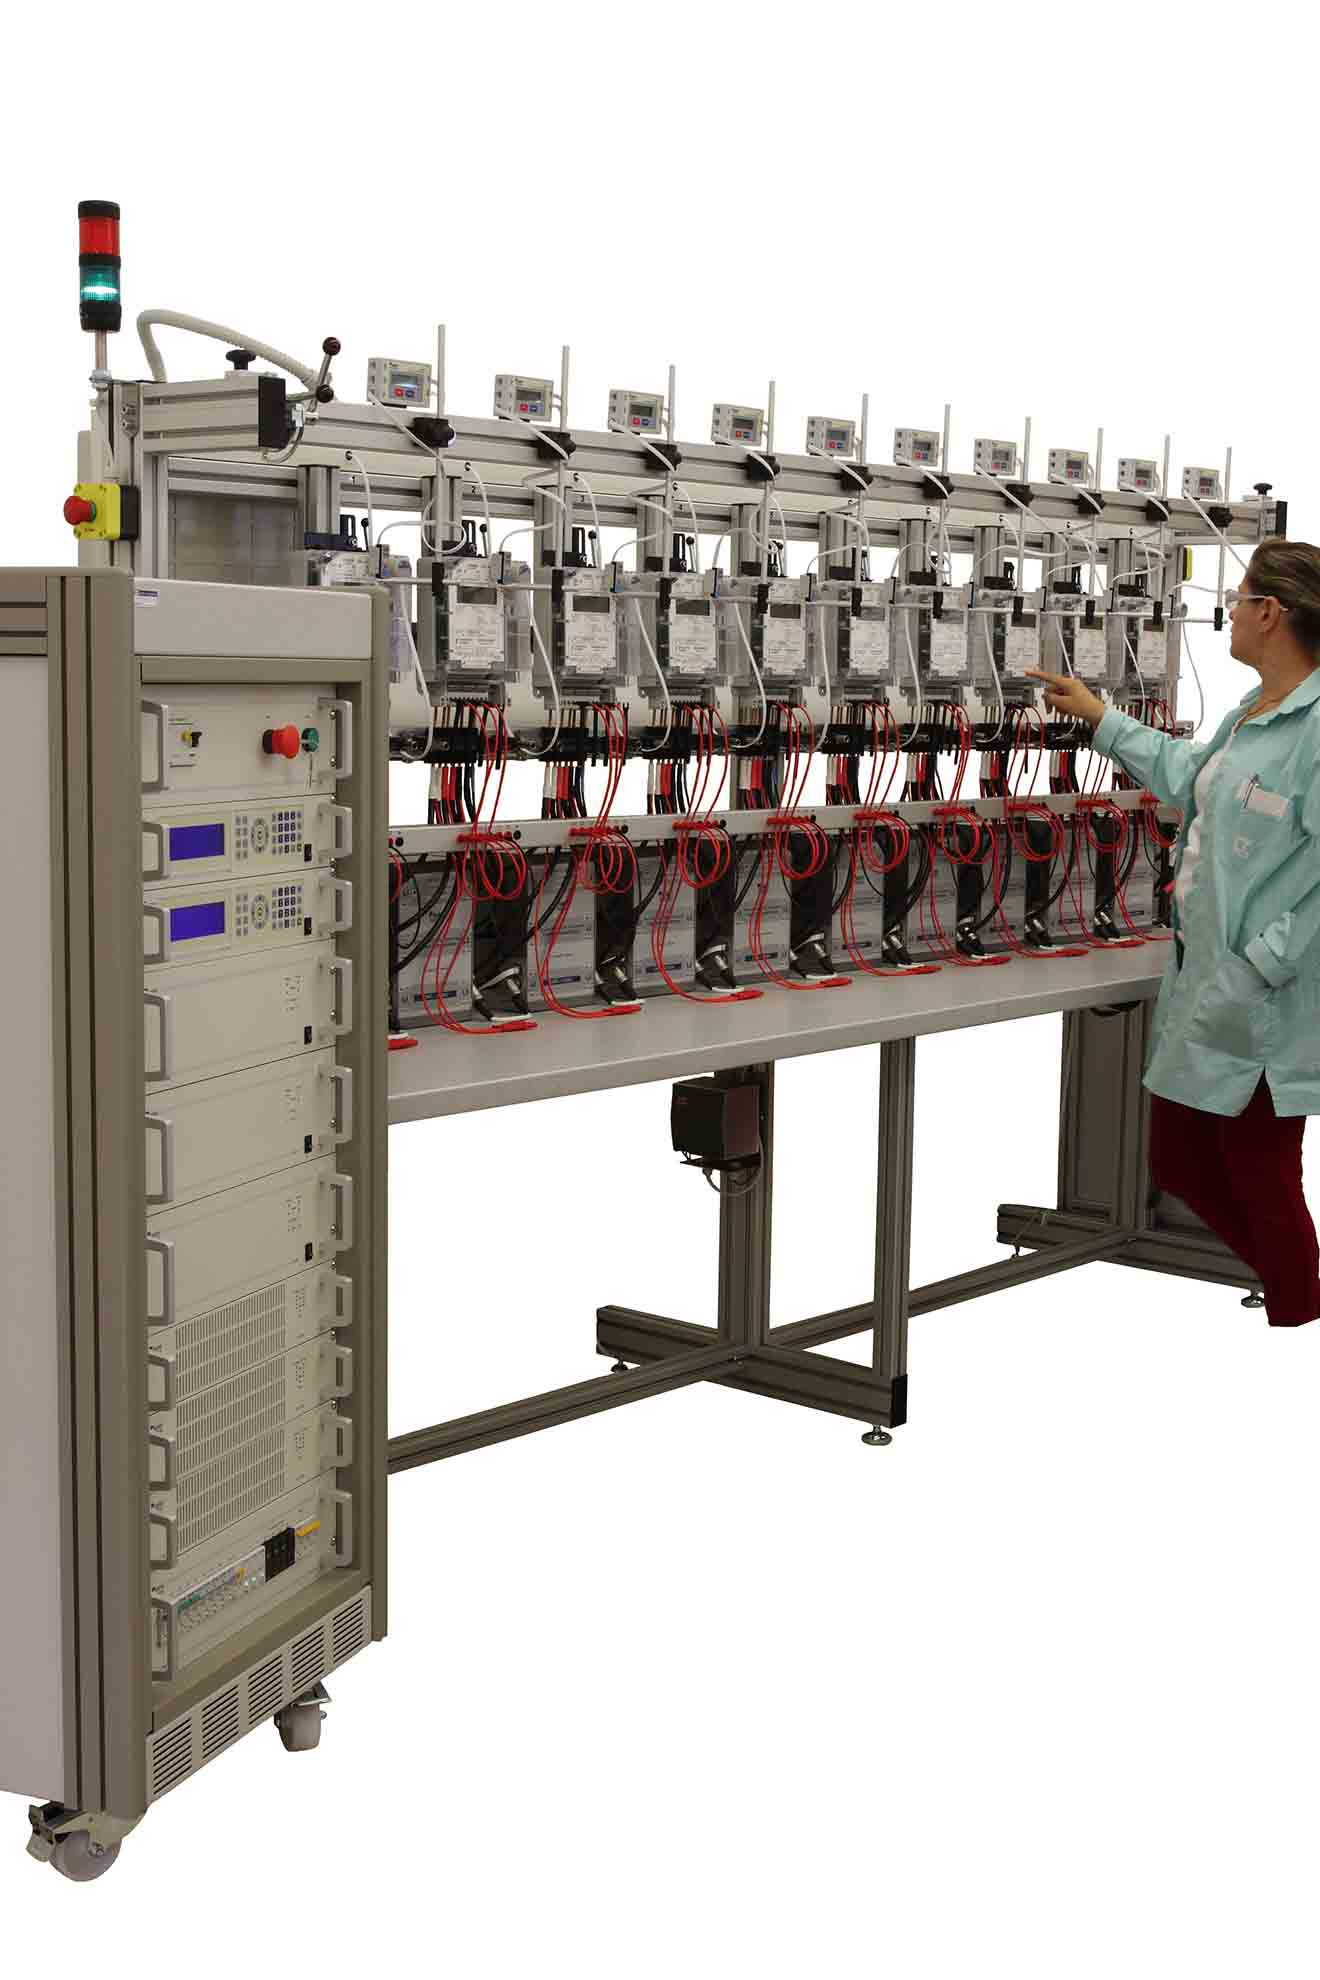 Applied Precision Ltd Electricity Meter Test Equipment Elma Powersupply Integratedcircuit Testing